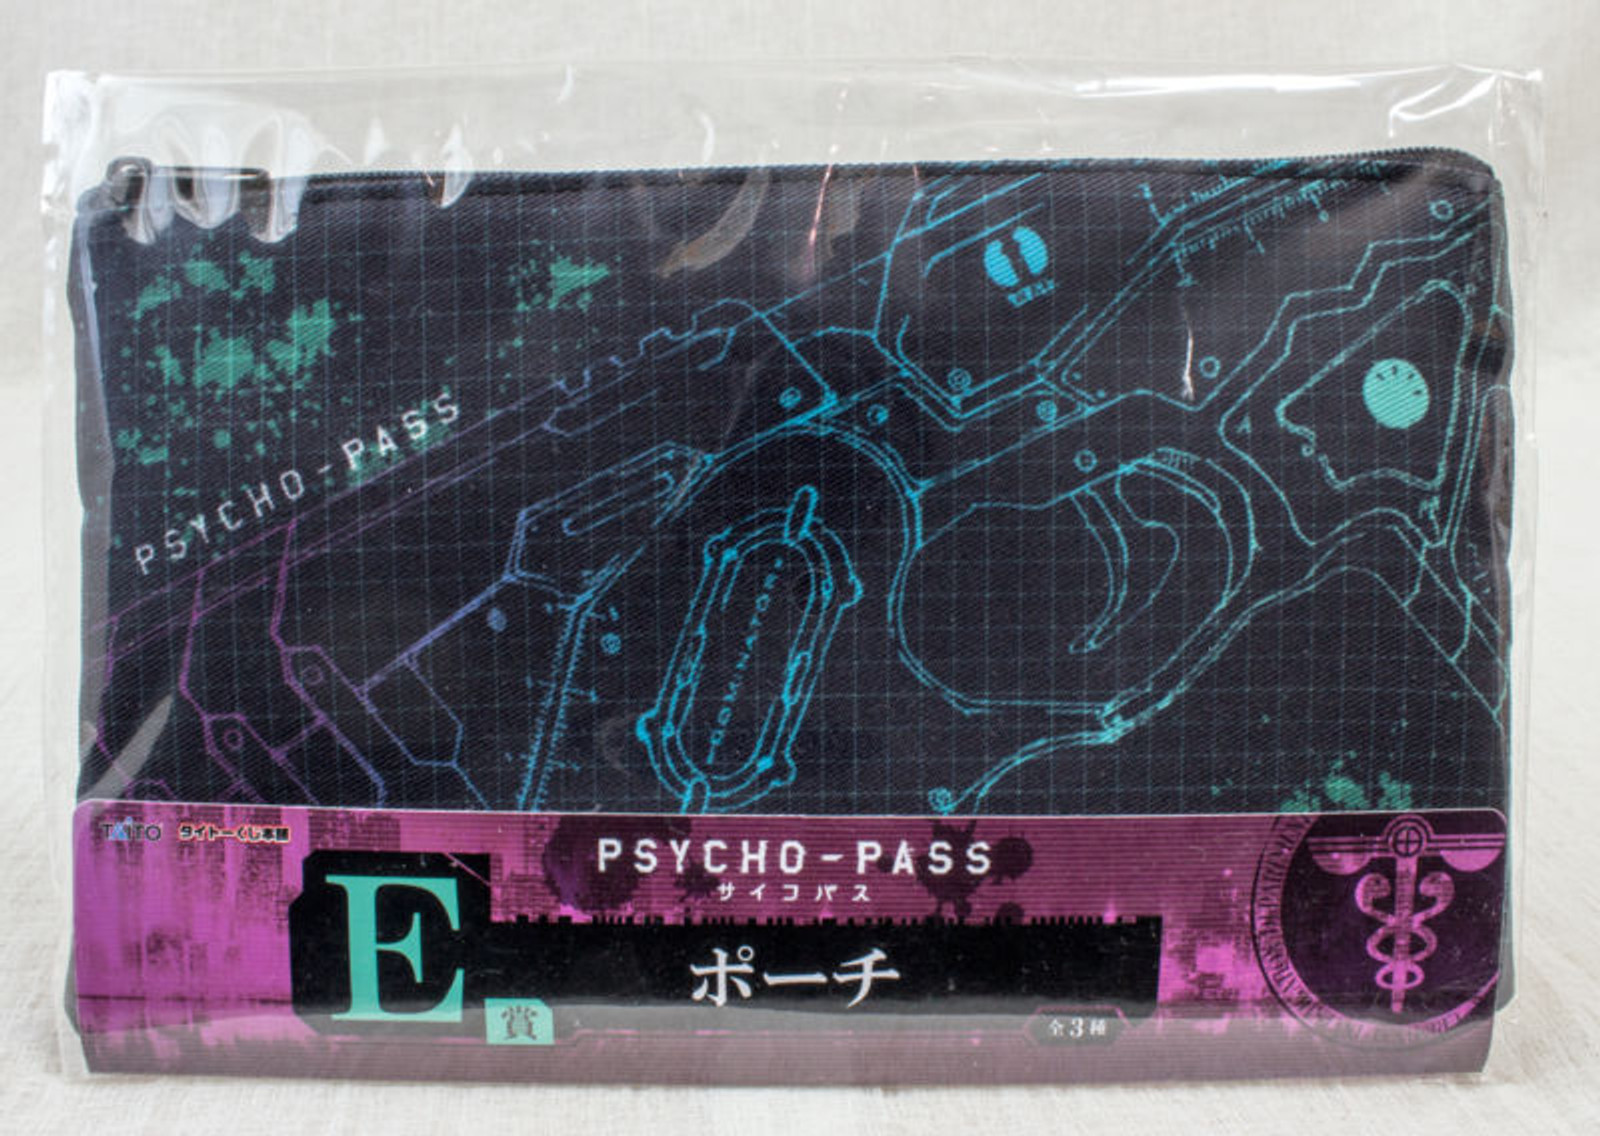 Psycho-Pass Dominator Ver. Pouch Mini Bag Taito Kuji JAPAN ANIME